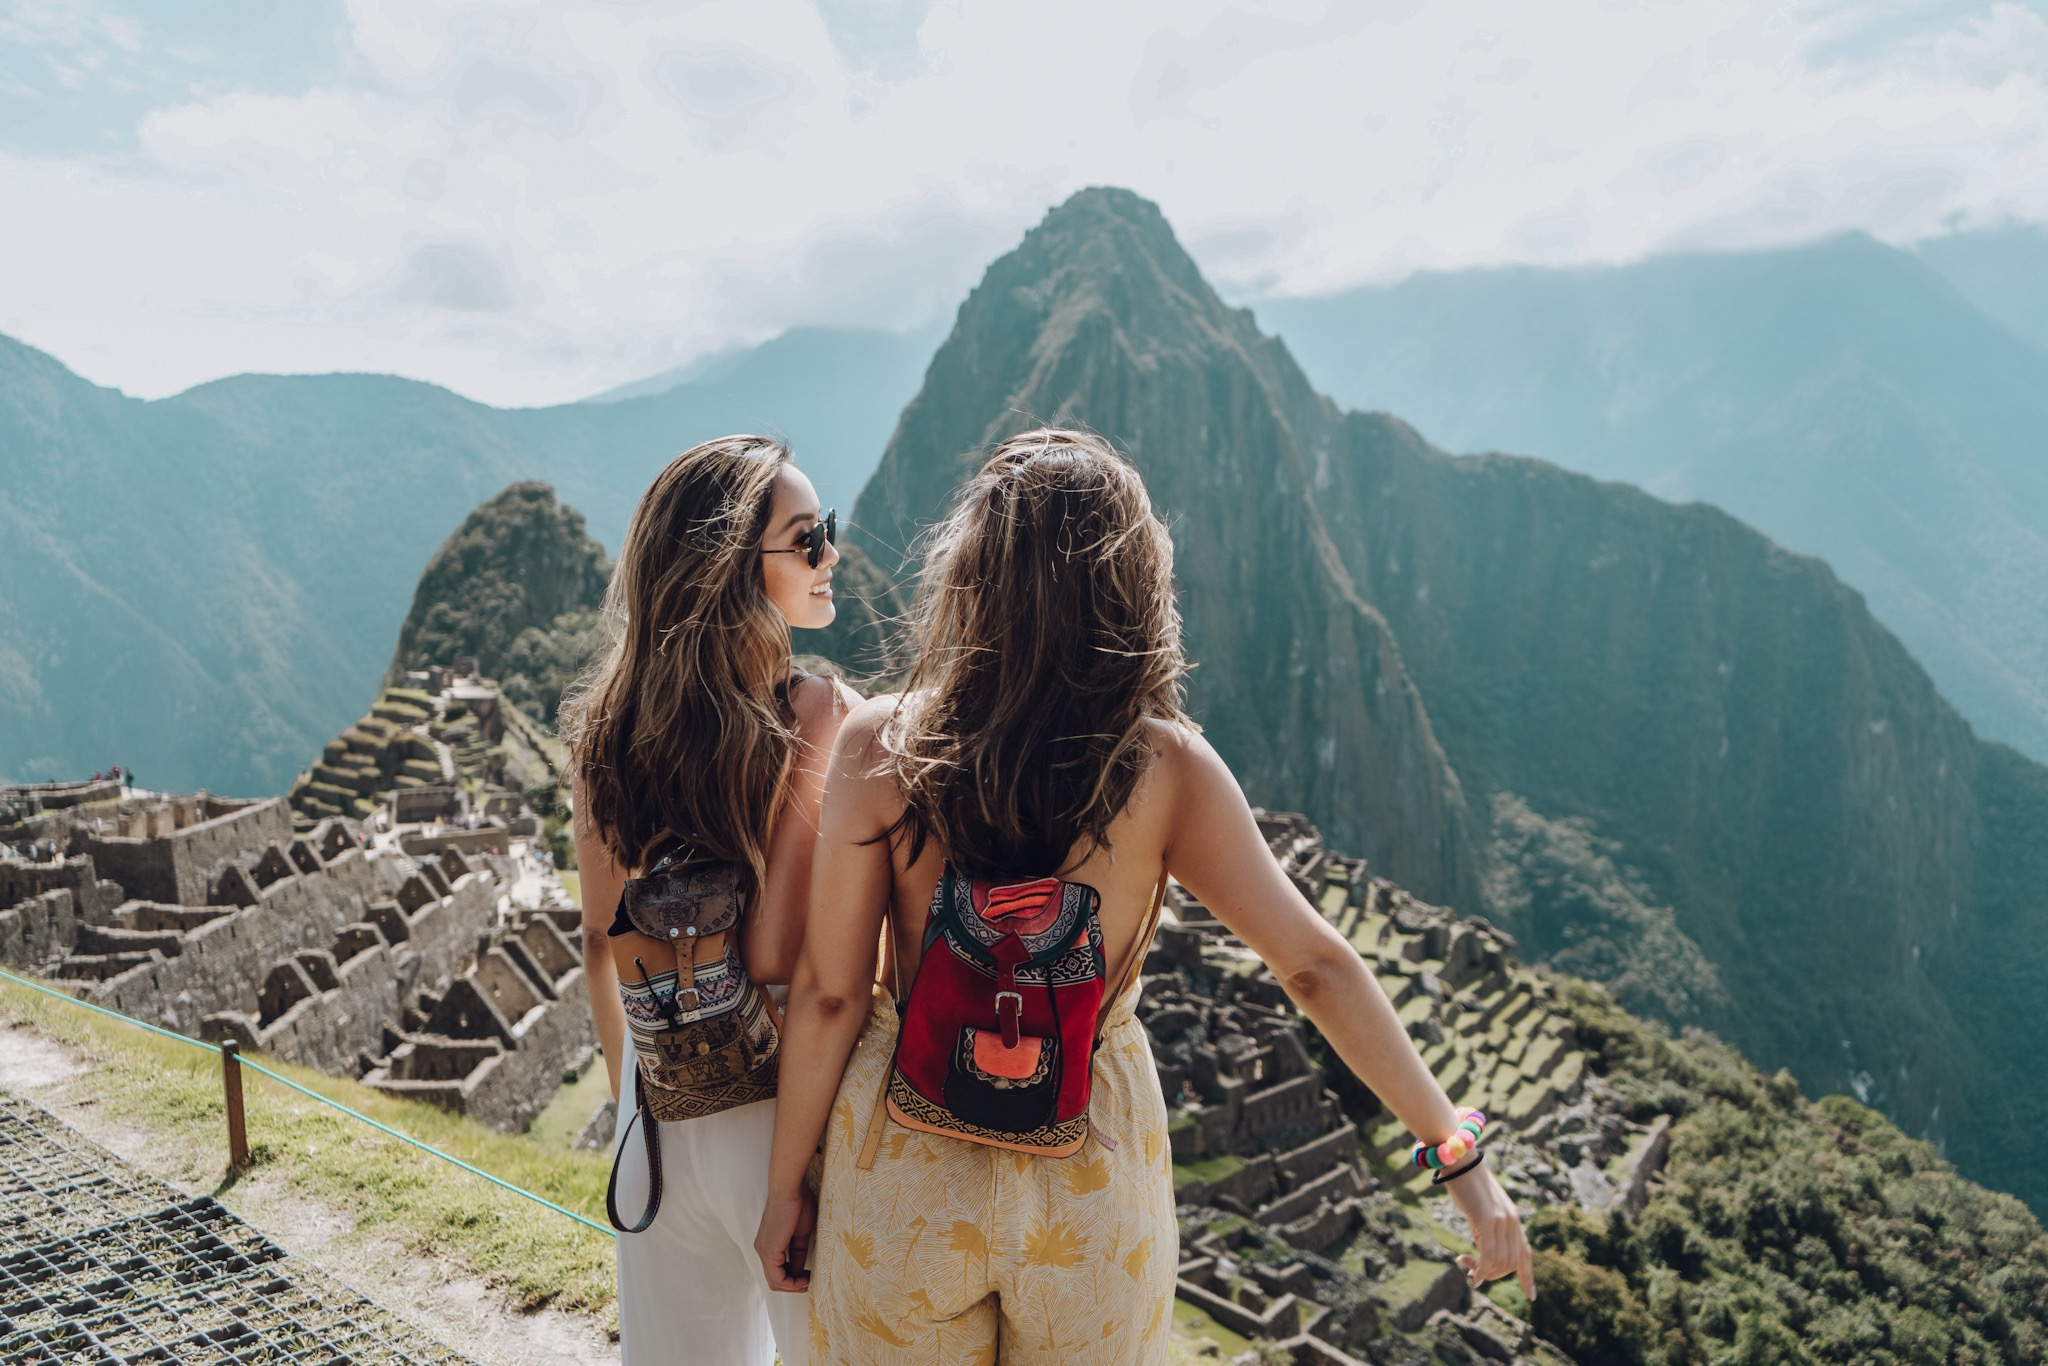 Machu_Picchu-tra_and_nitty-3.JPG